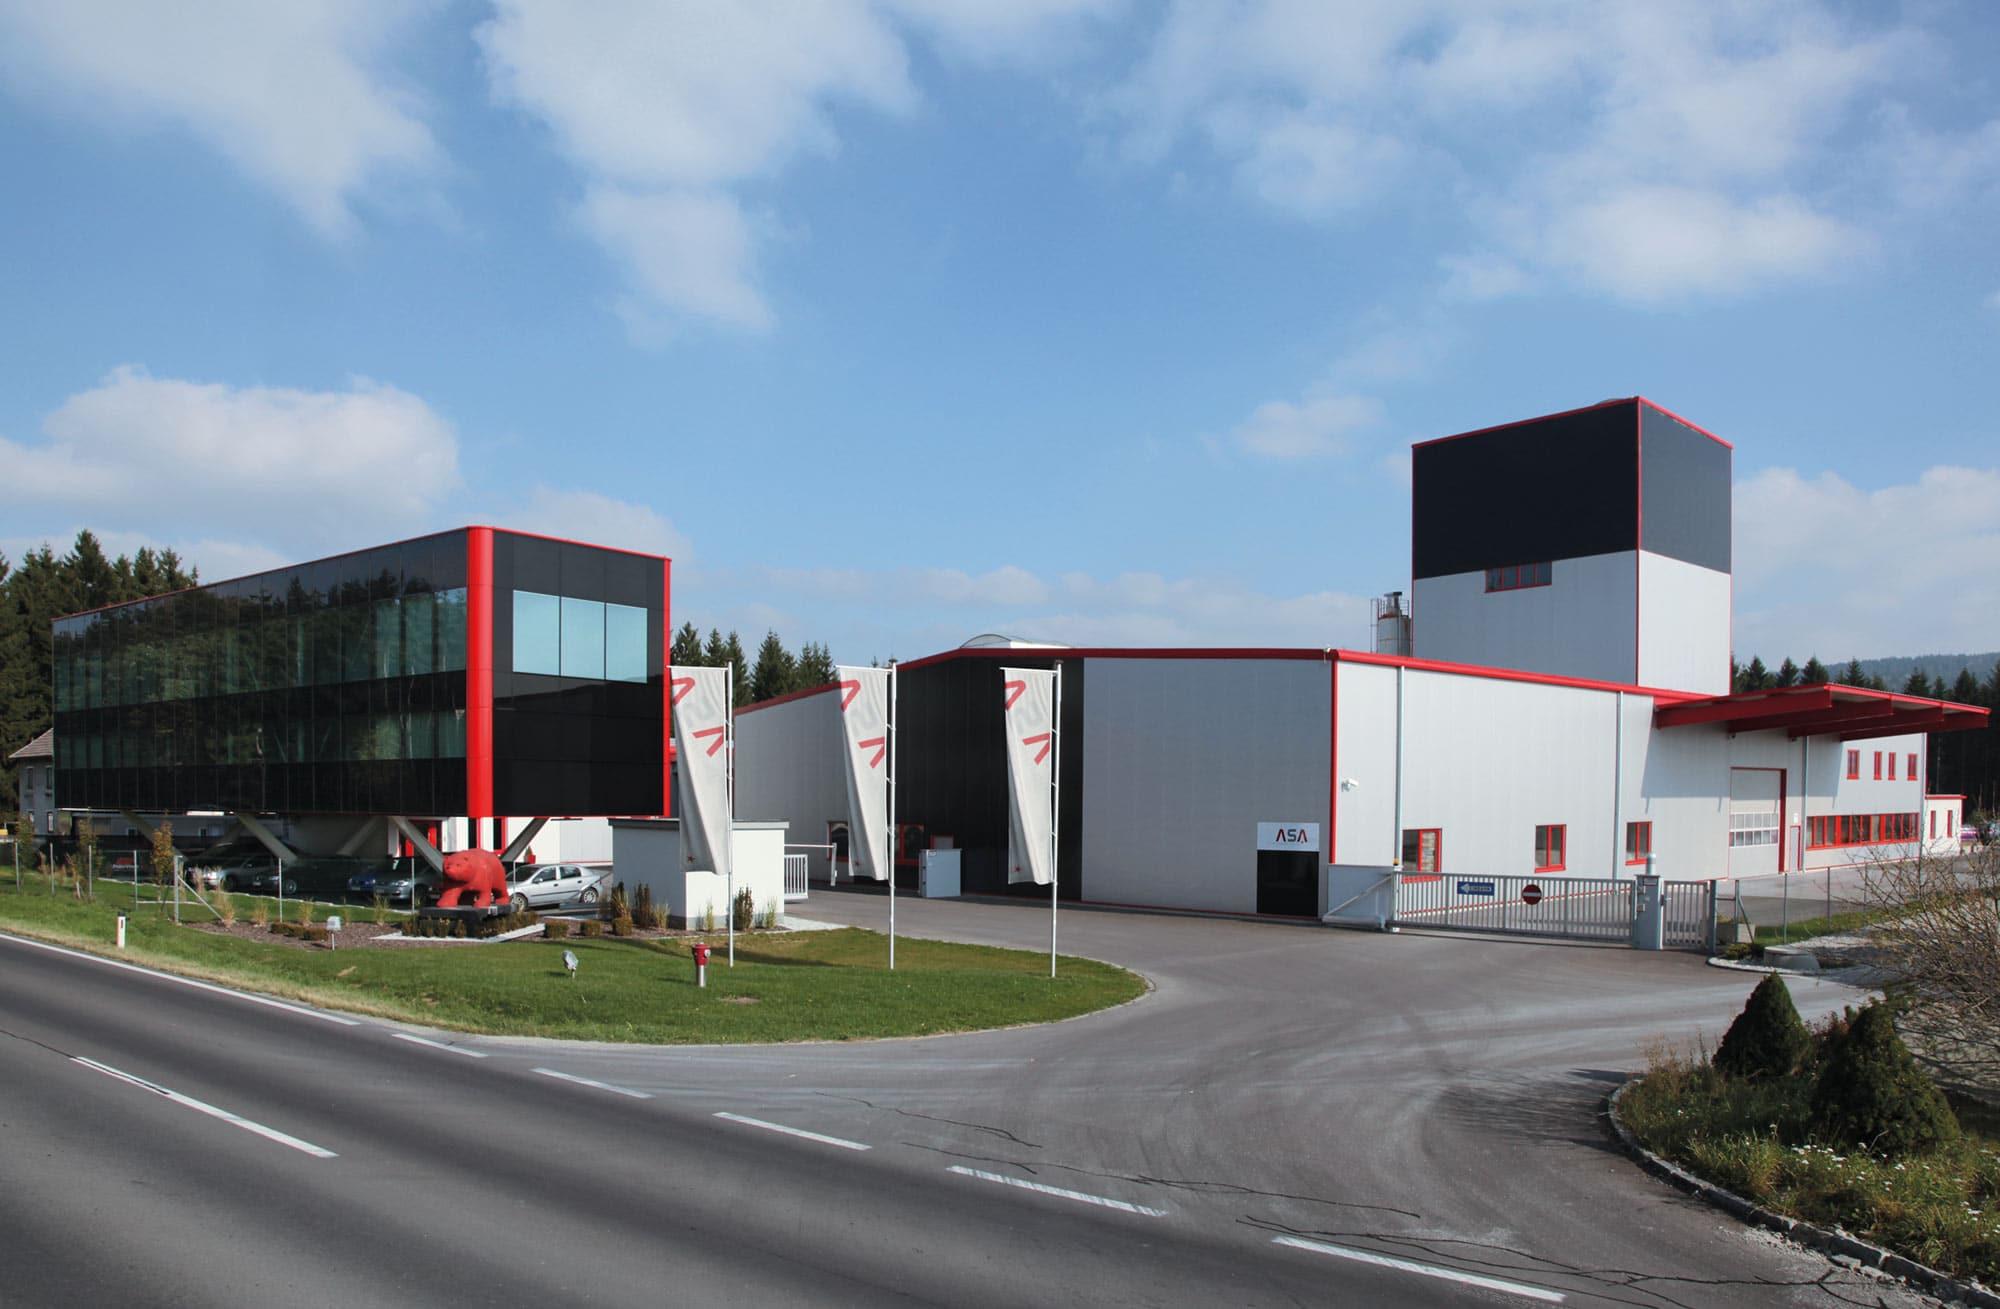 ASA Astrosysteme GmbH